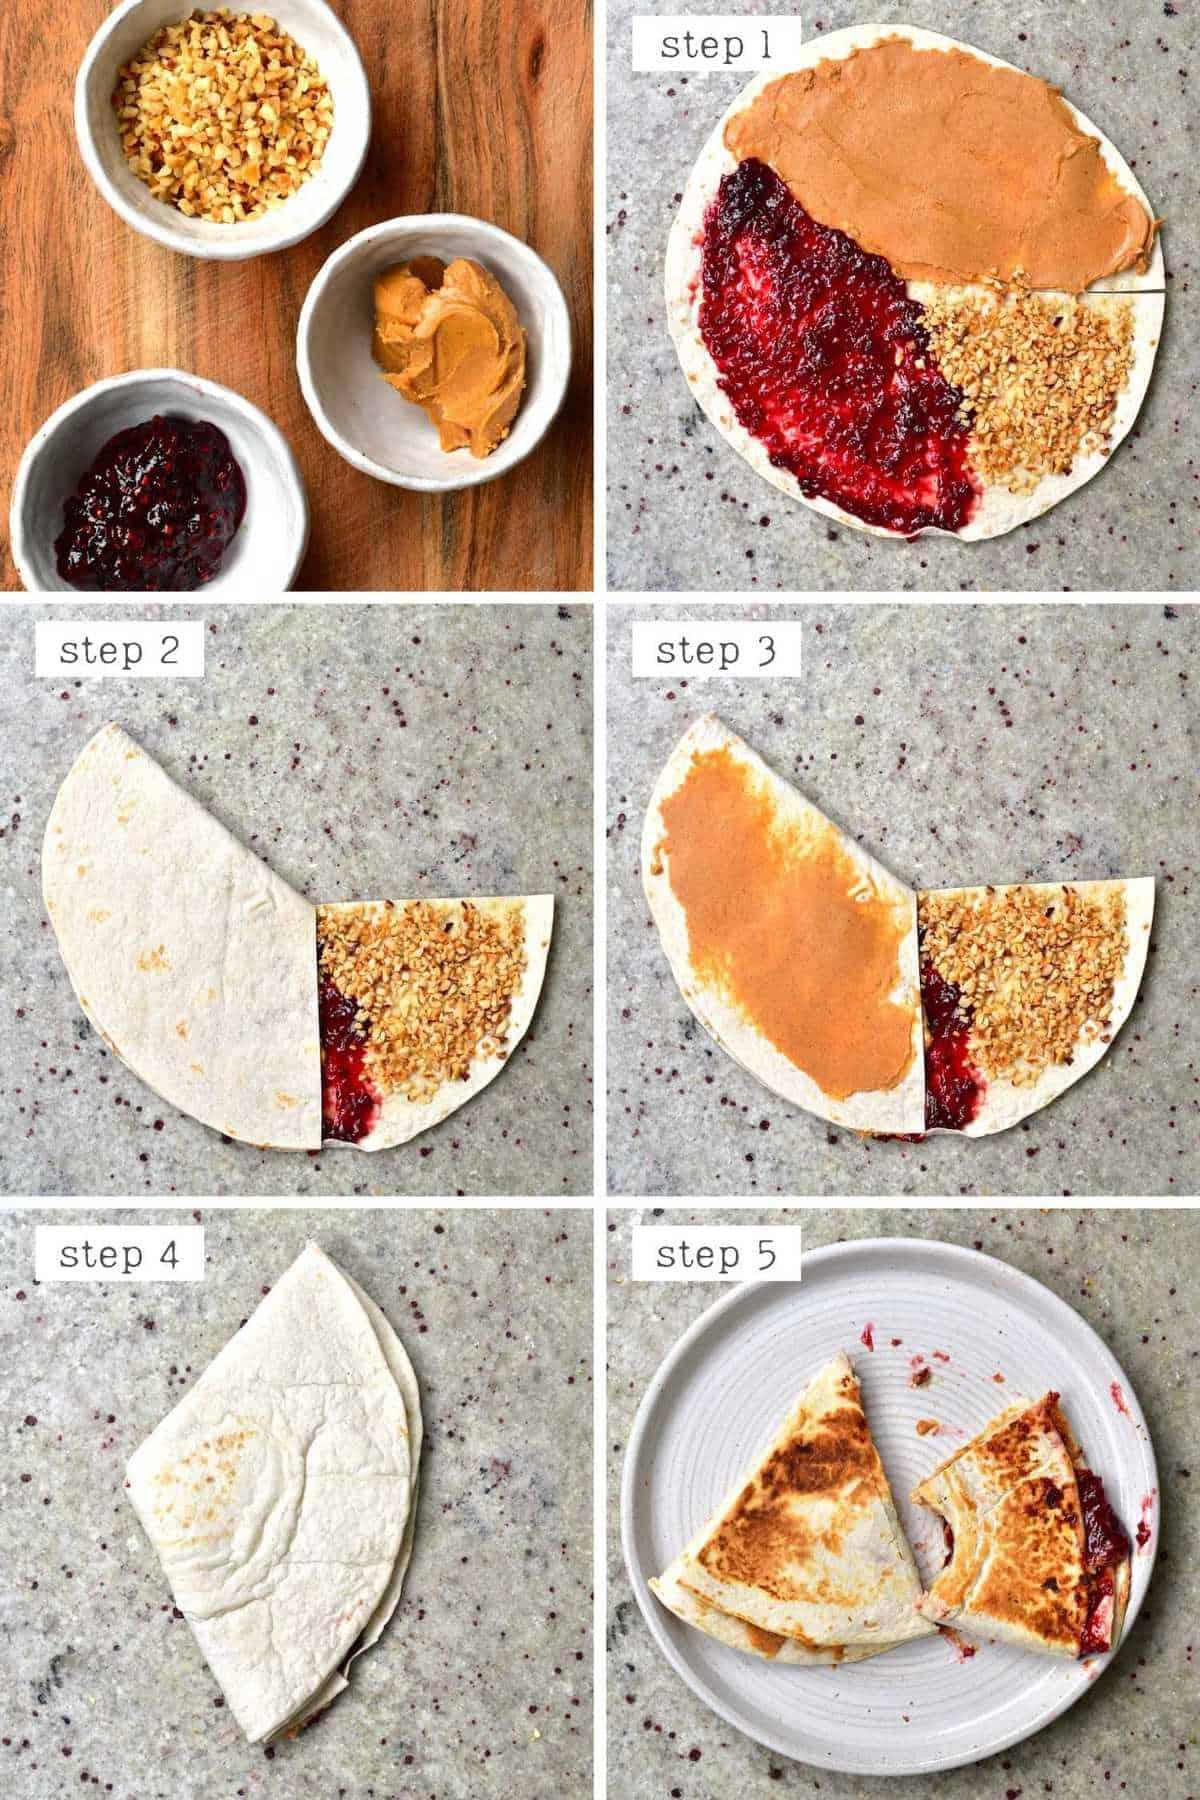 Steps for making PB&J Tortilla